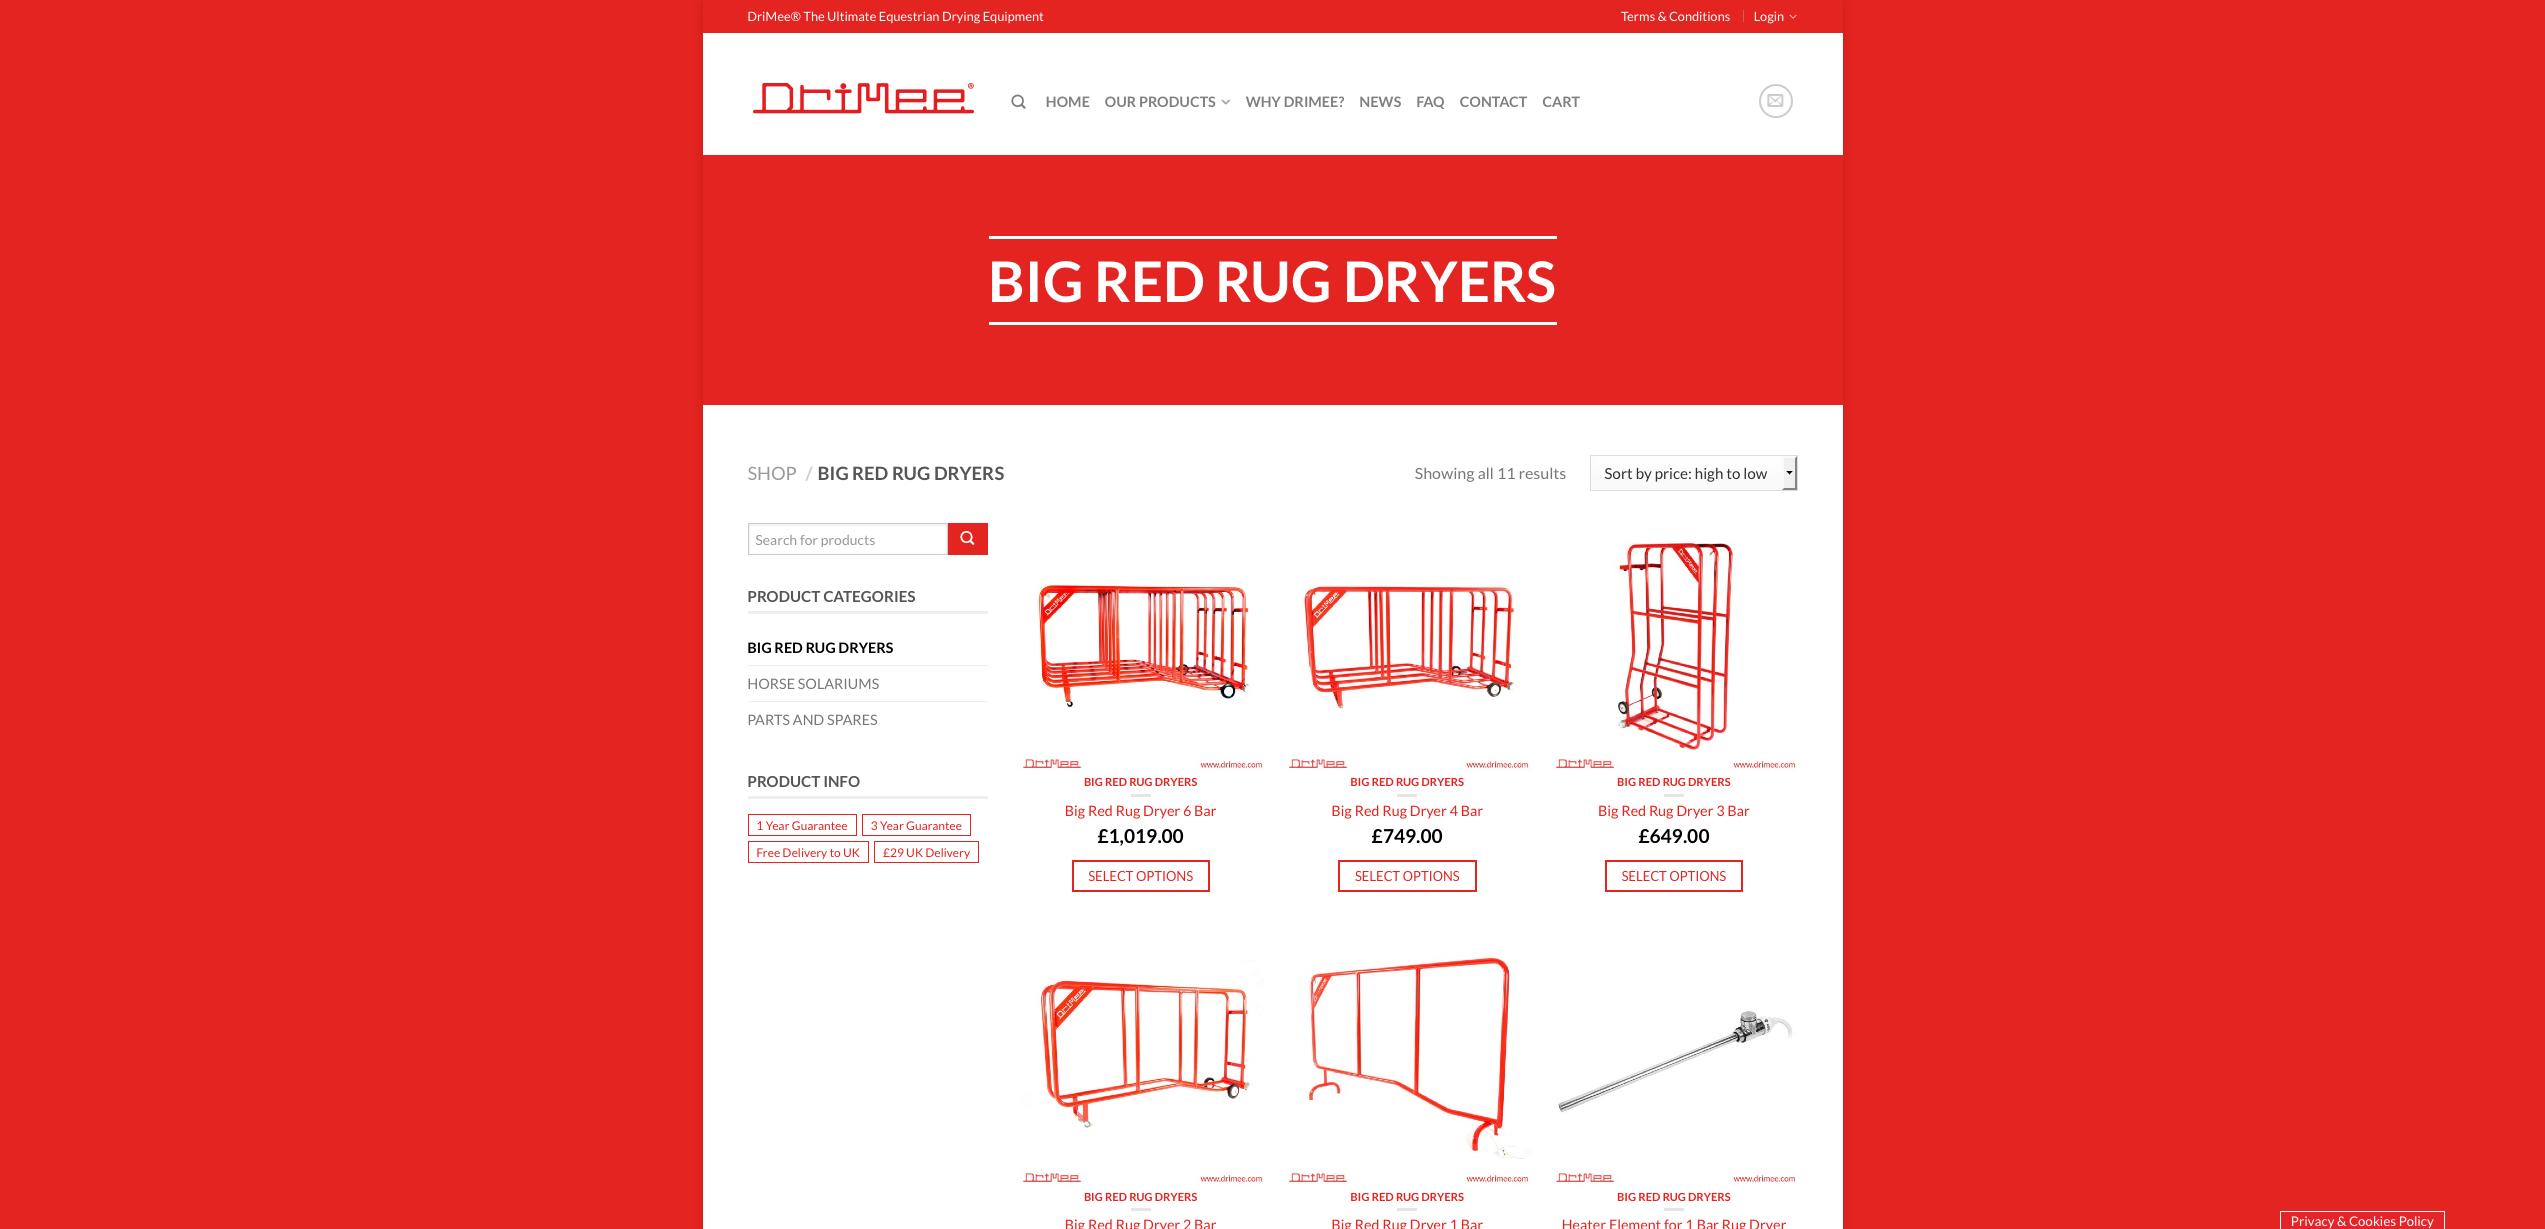 IDEA UK Design and Marketing Drimee Equestrian Horse Equipment Website Design 12